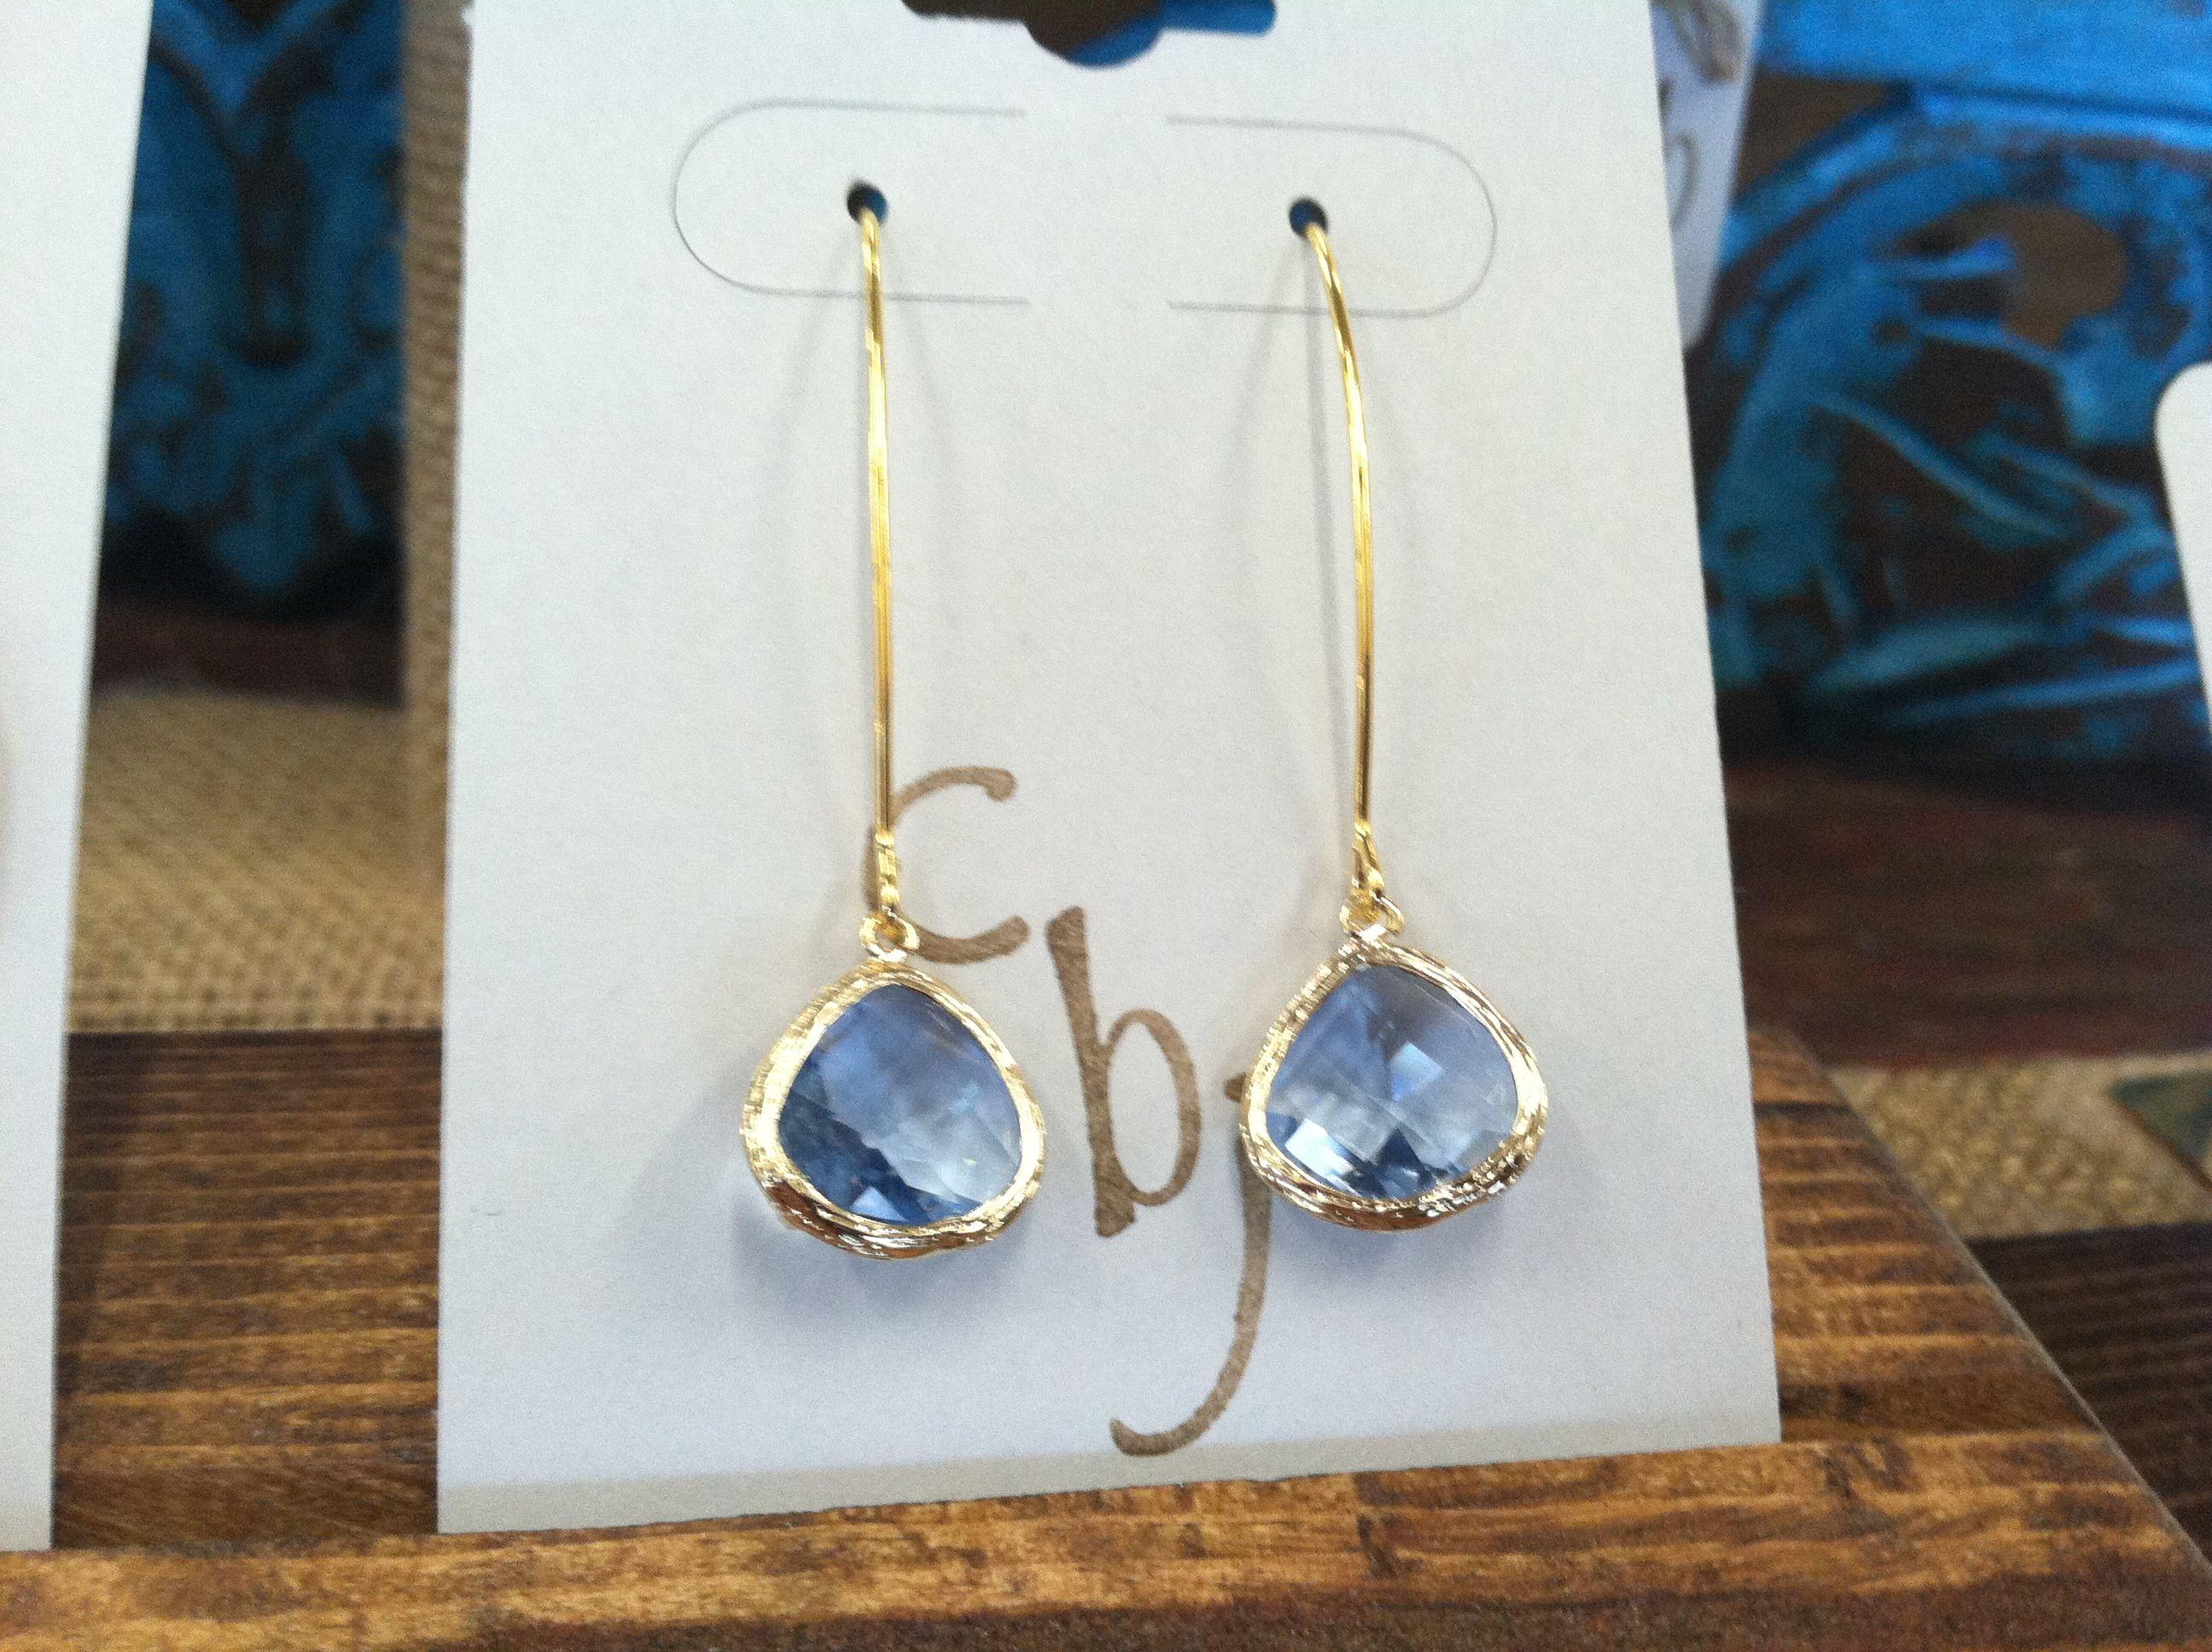 14K Gold Plated Blue Glass earrings $20